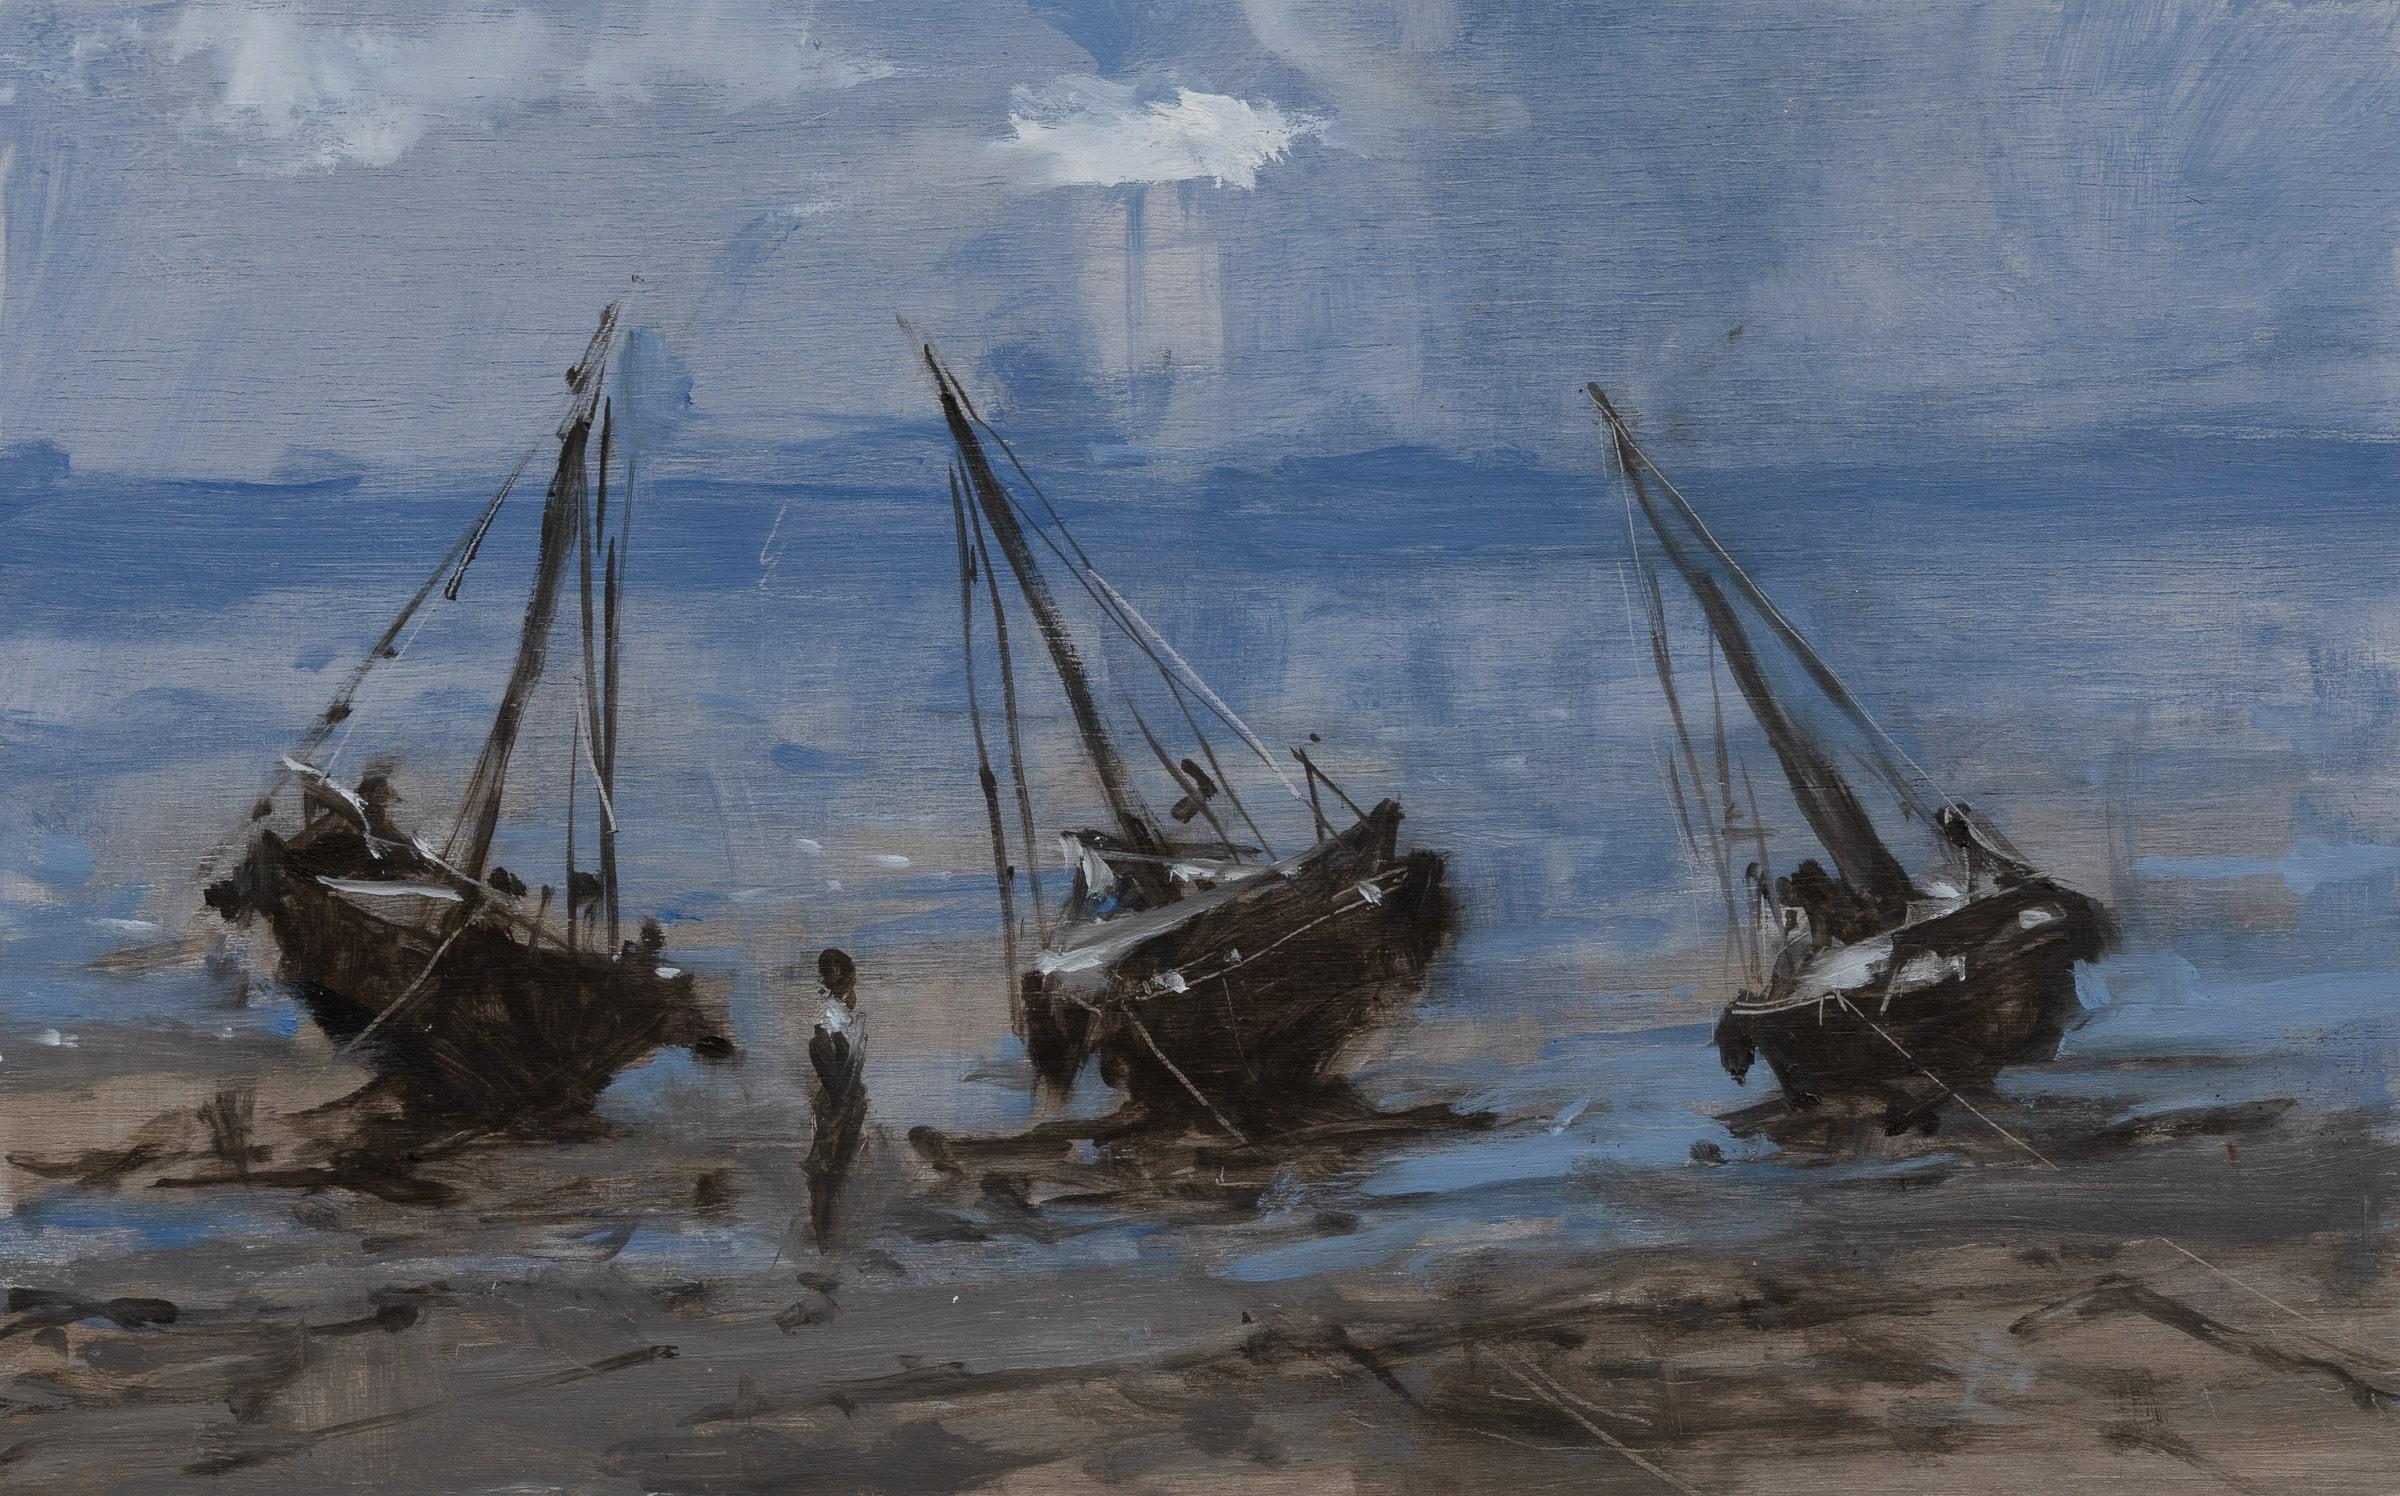 Marinas n°1 (Tanzania) - Landscape Painting